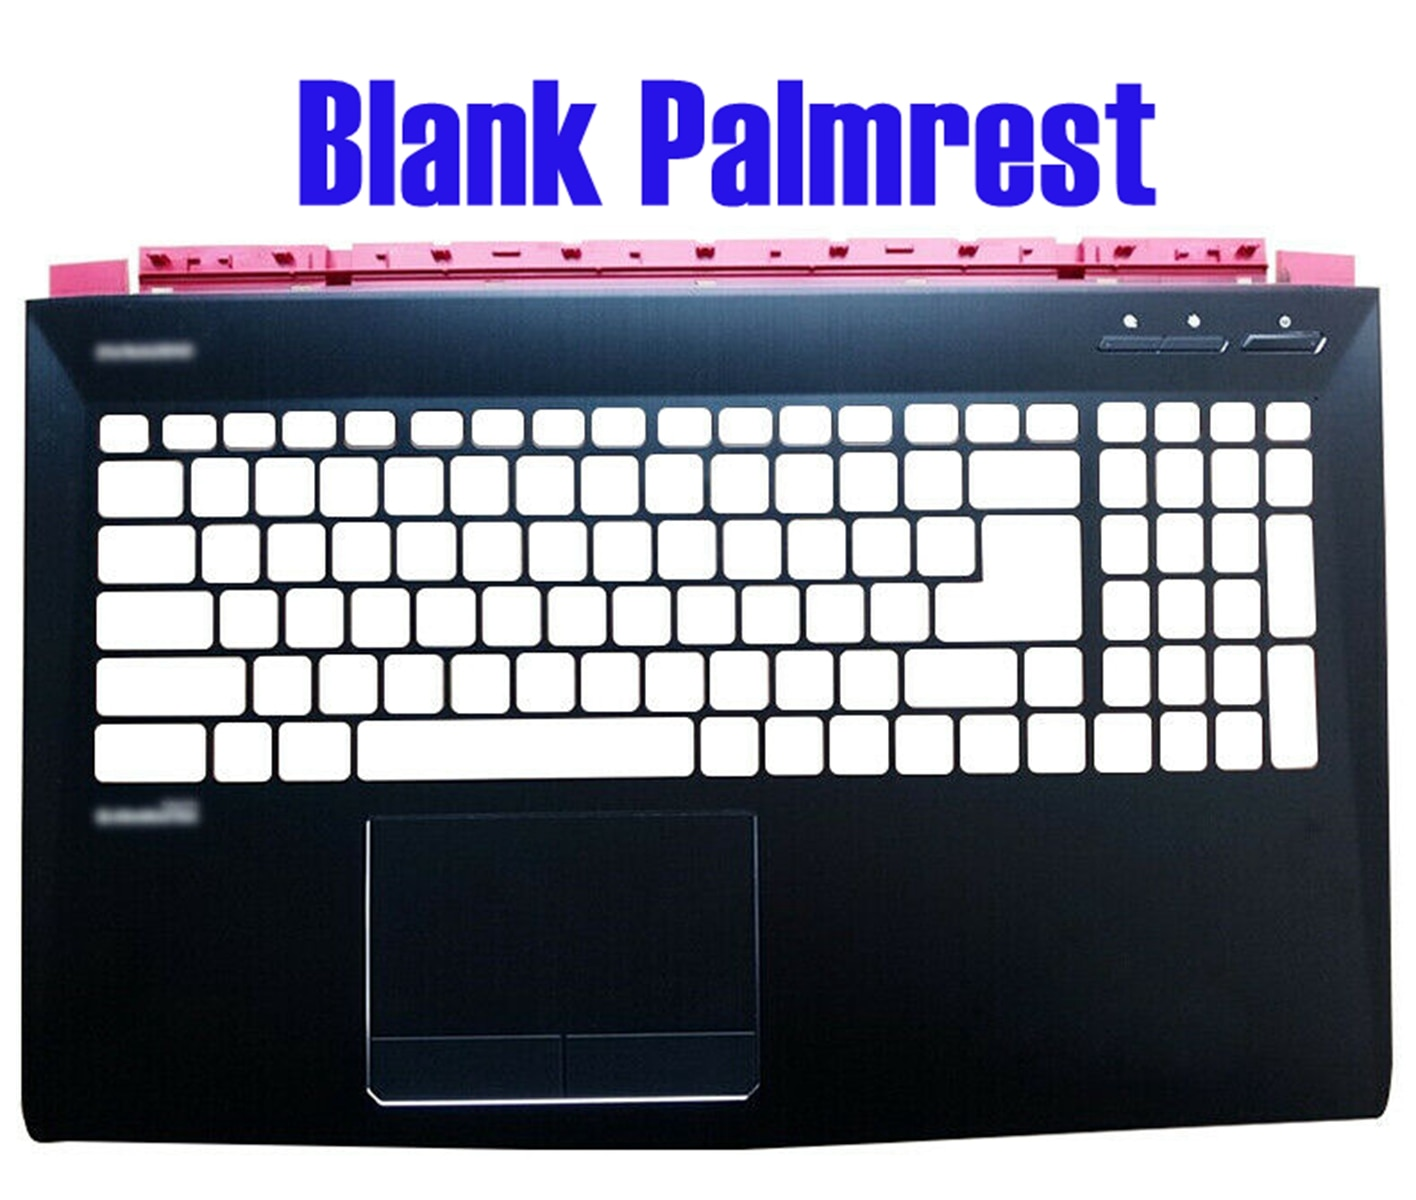 Palmrest para MSI 9S7-16J932 9S7-16J982 GE62 7RE/GE62 7RD(MS-16J9)